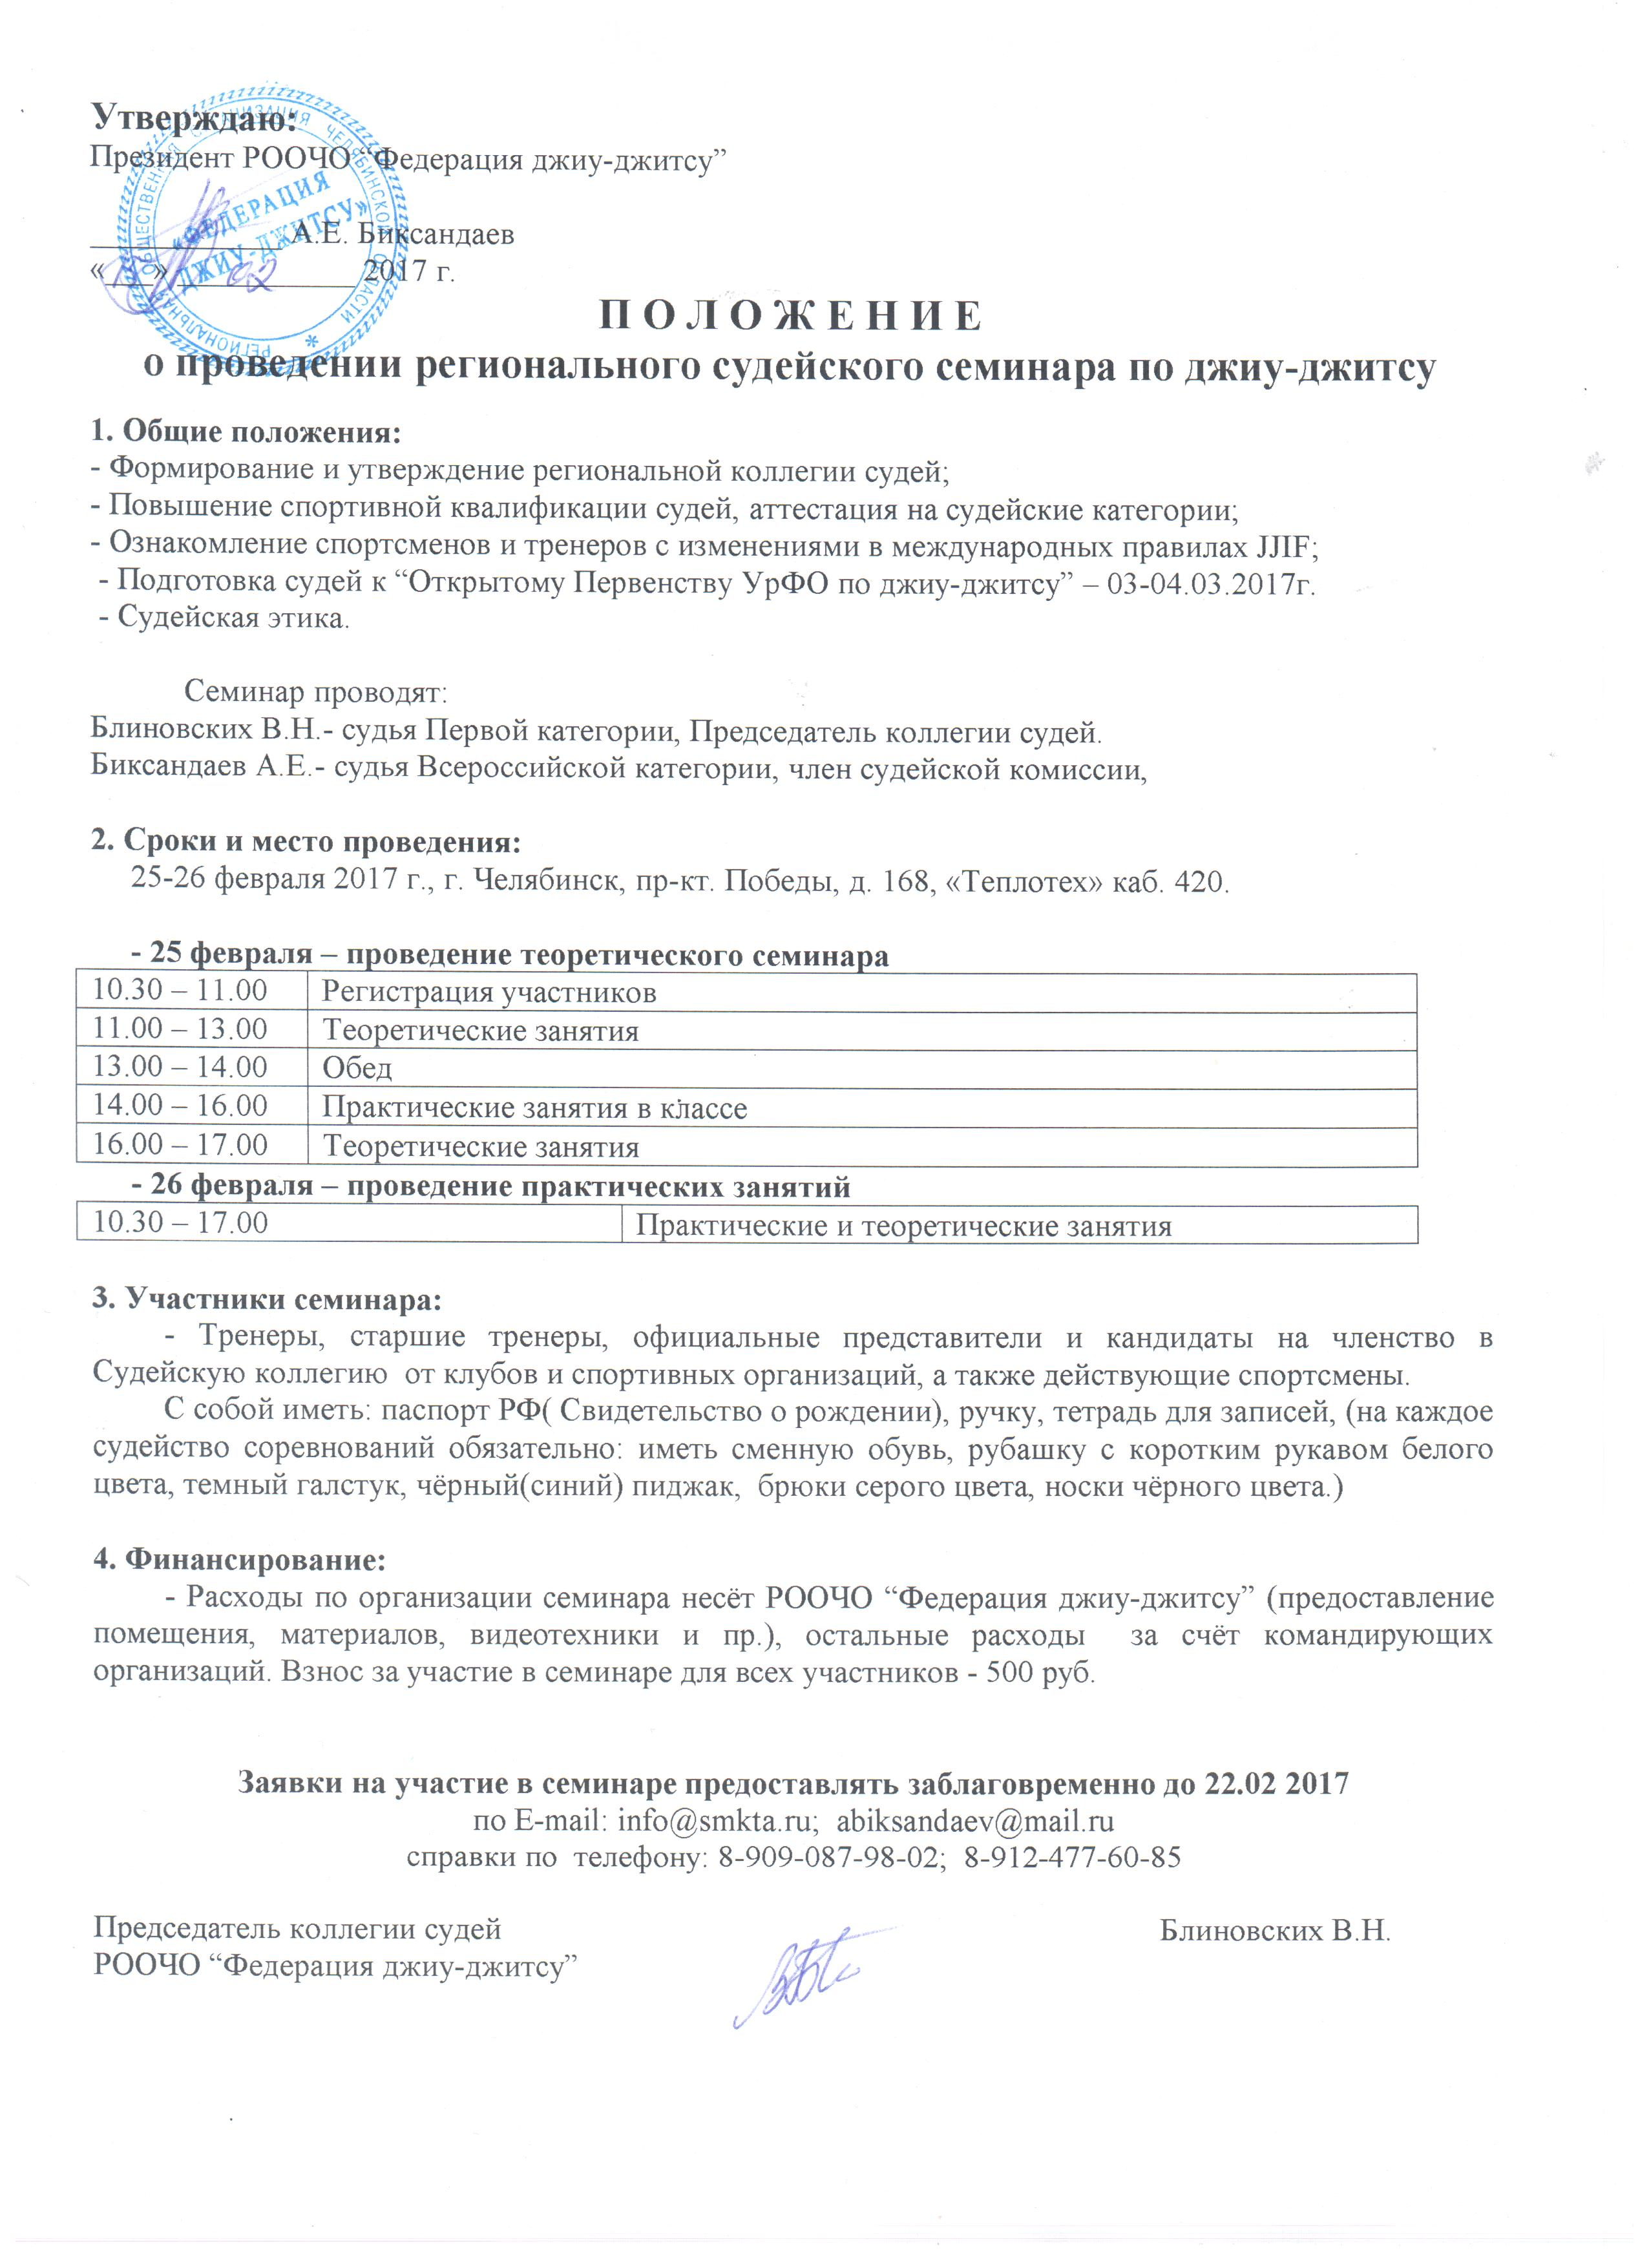 Семинар судей 25-26.02.17 Челябинск(2).jpg